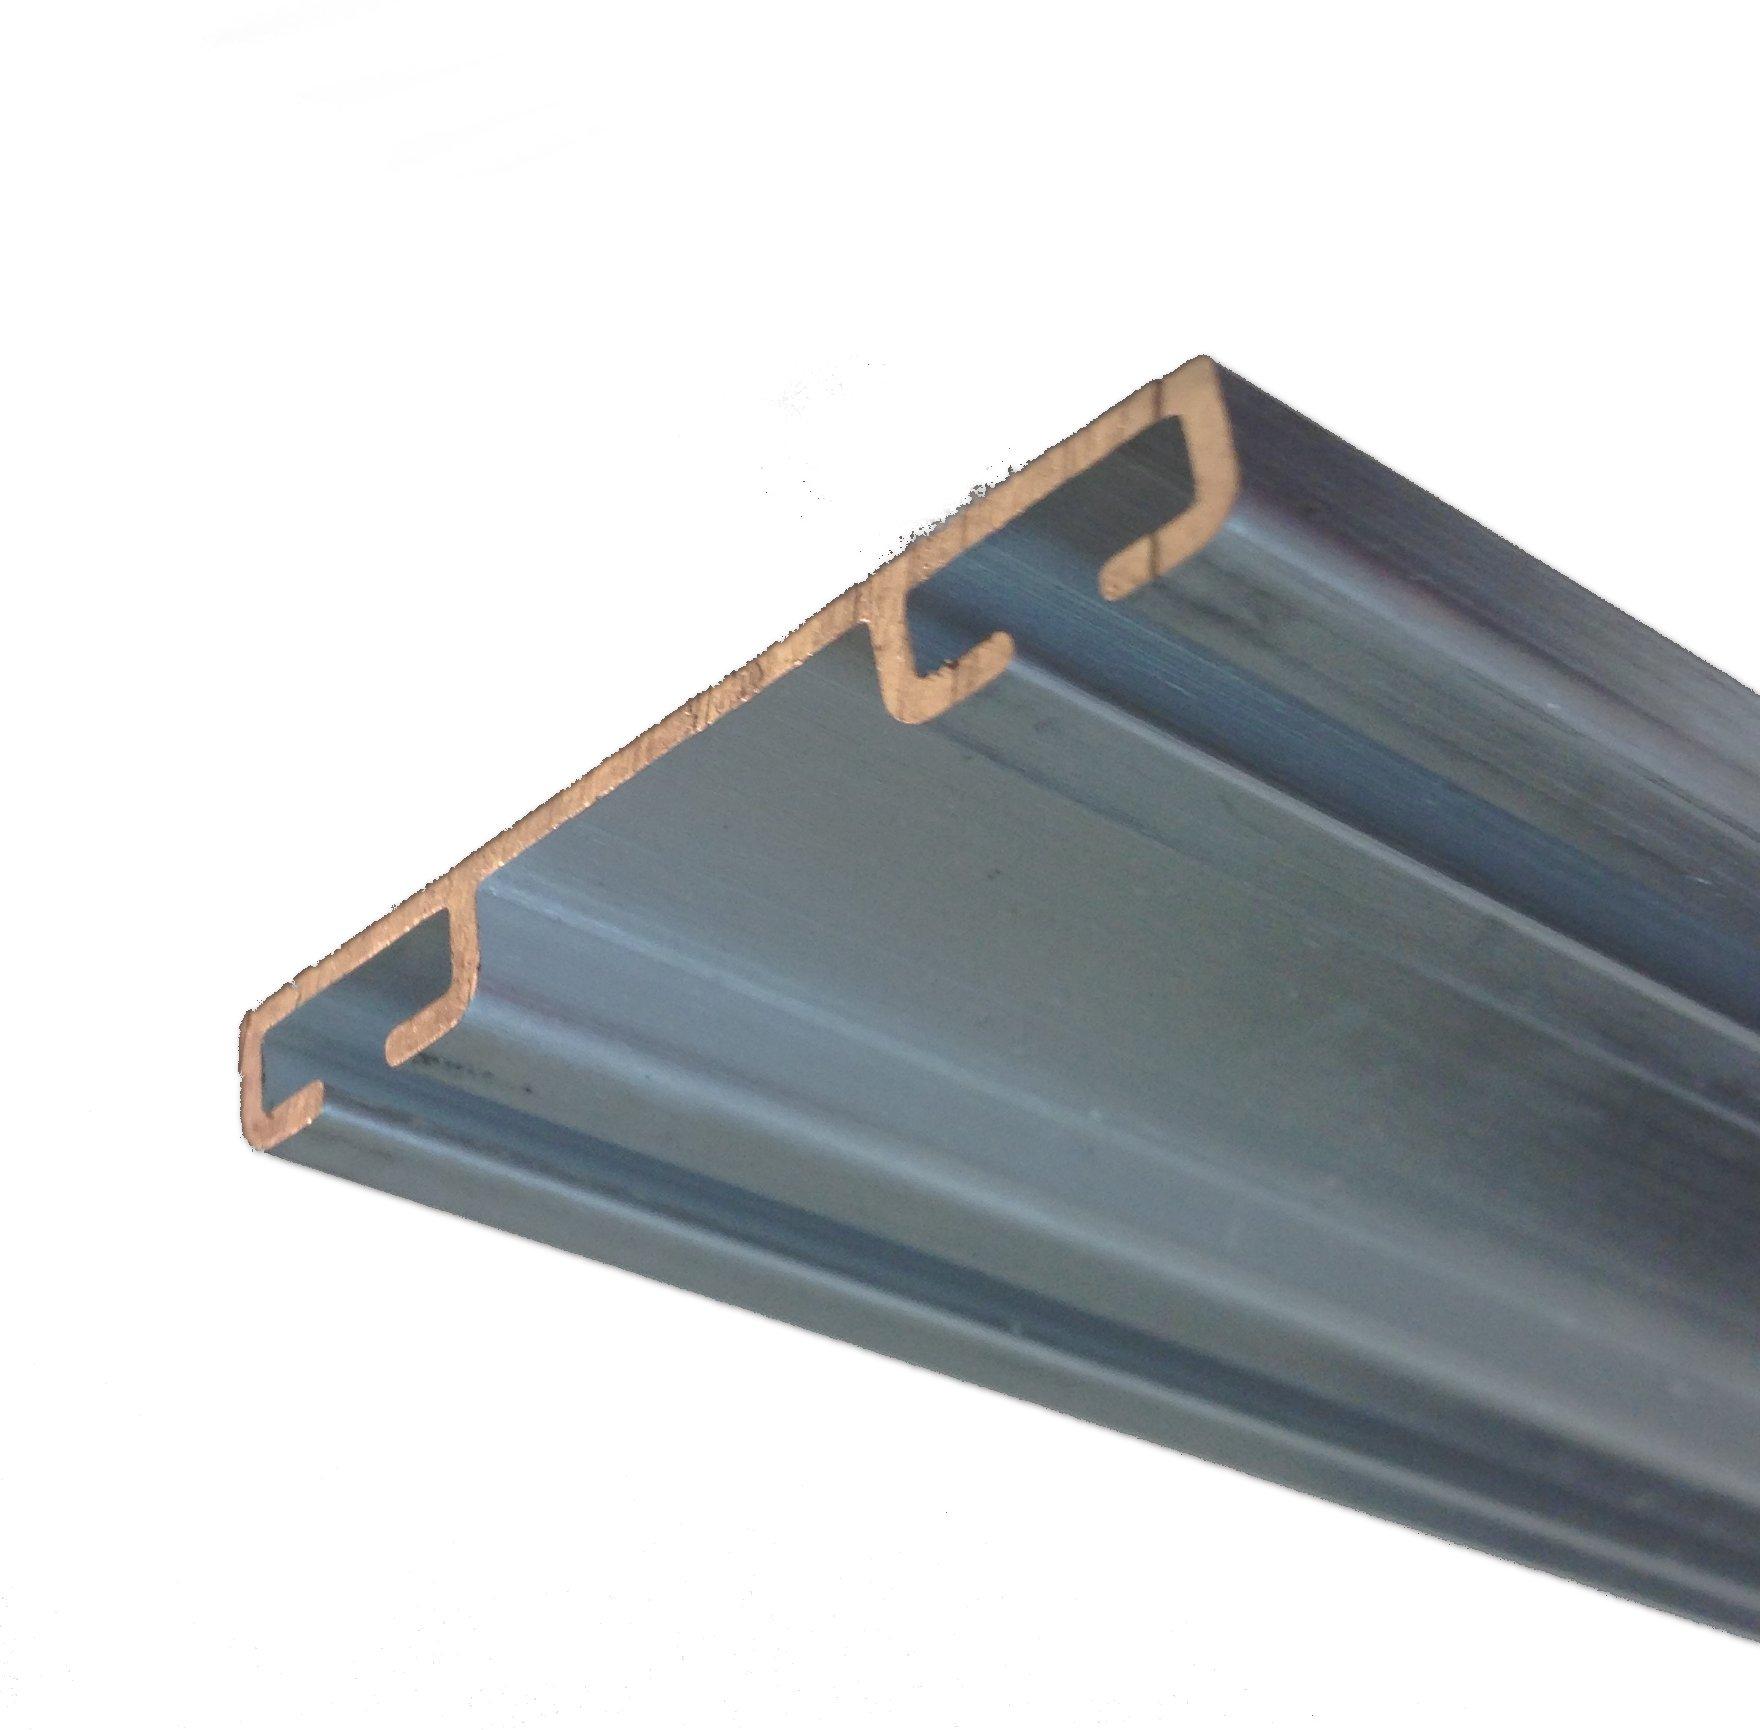 aluminumchannel.jpg